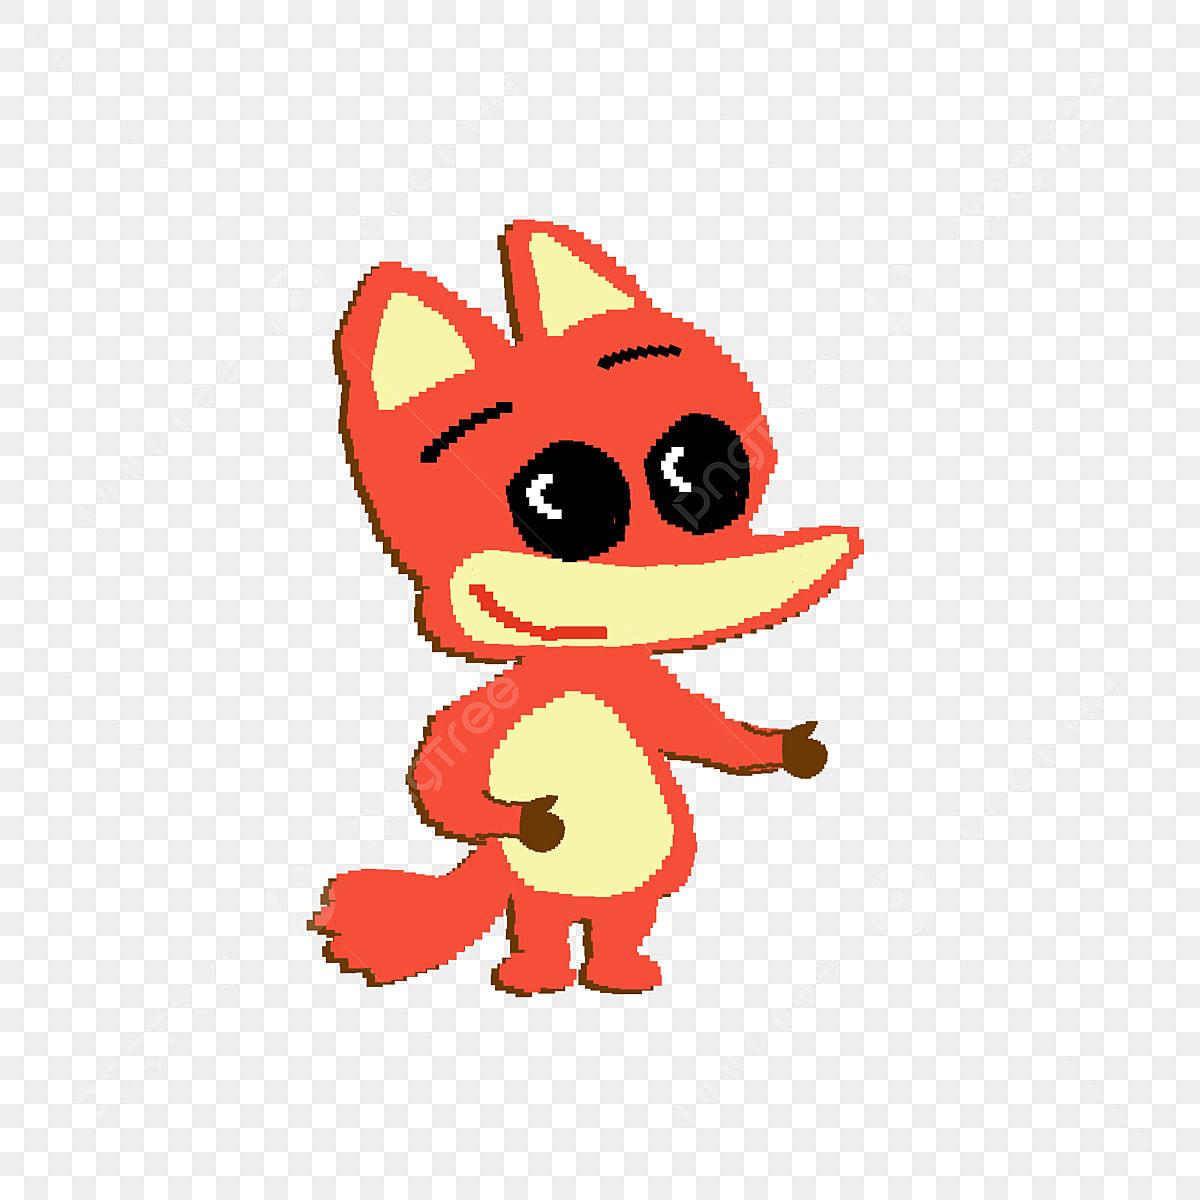 Pixelated A Little Fox Cartoon Hand Drawn Design With